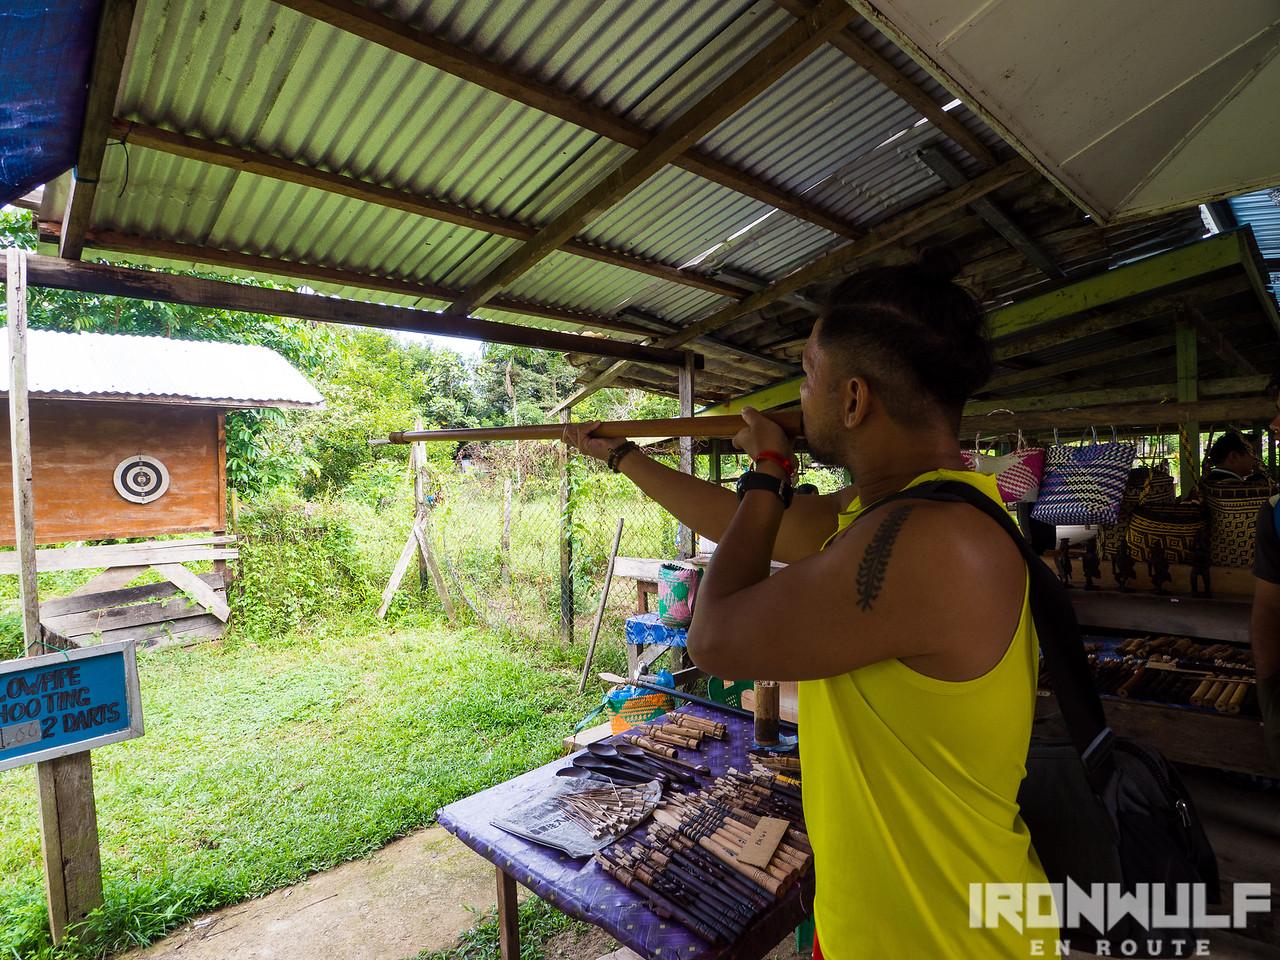 Blowguns target practice